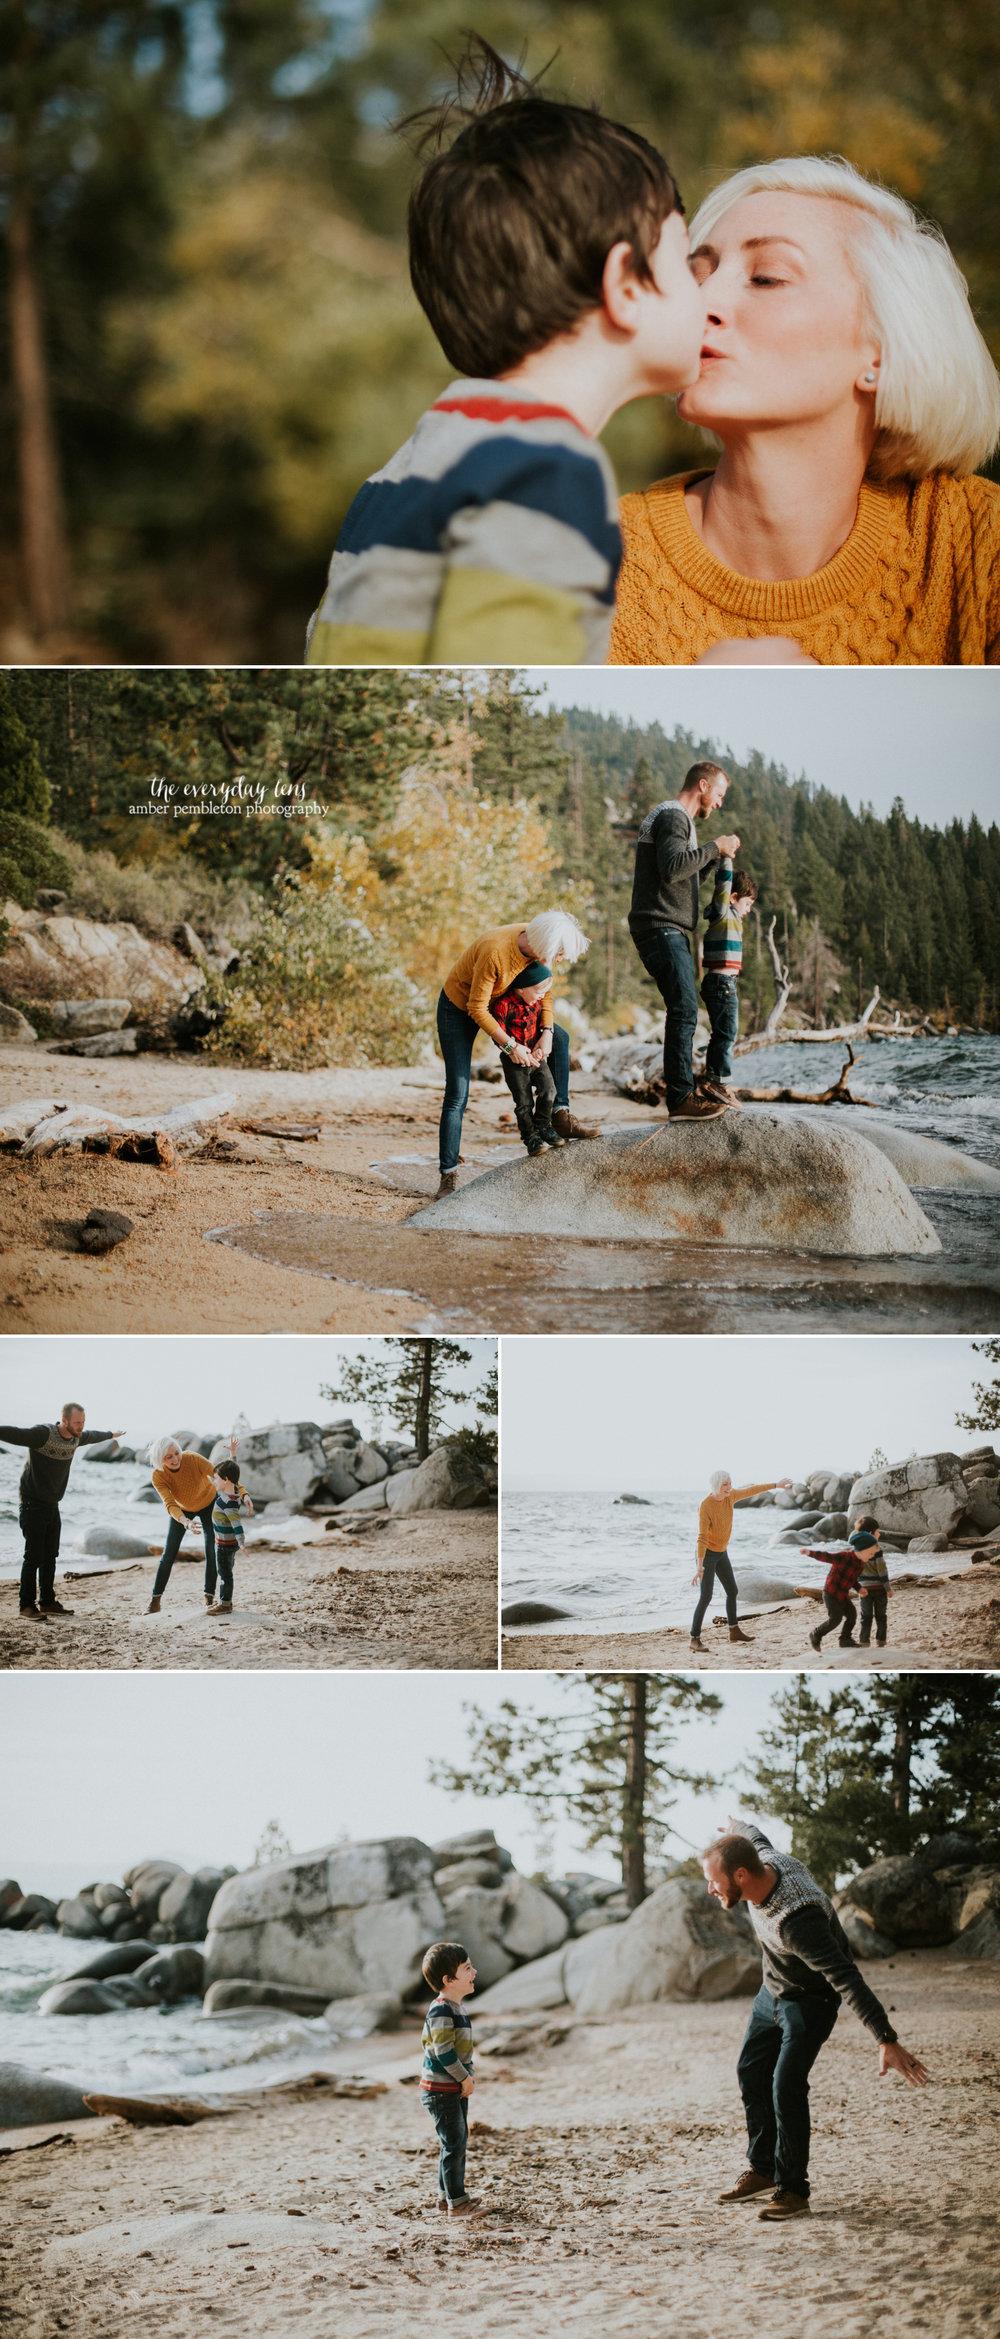 family-playing-chimney-beach.jpg